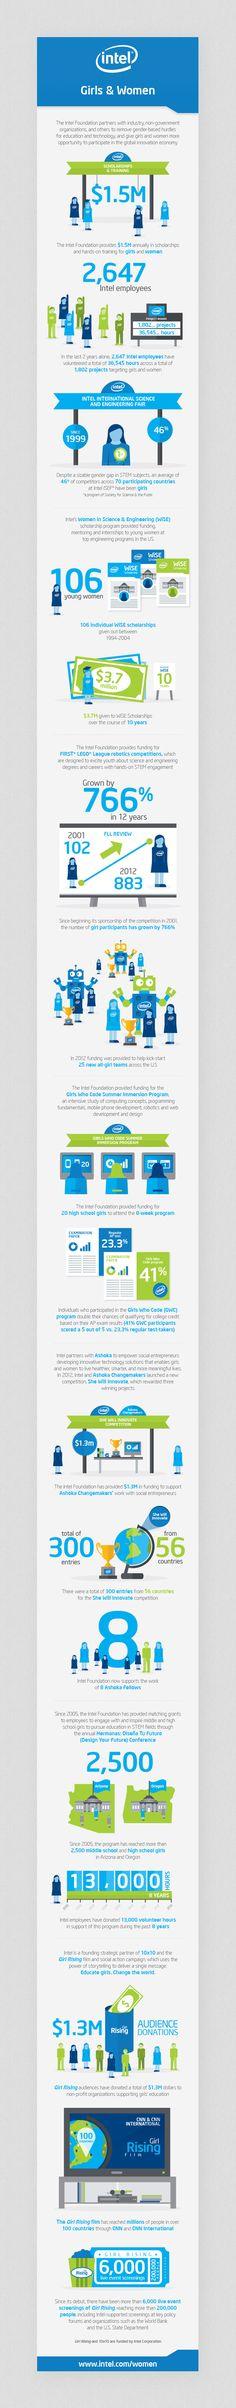 Intel Foundation 25th Anniversary // Infographics by Jonathan Quintin, via Behance